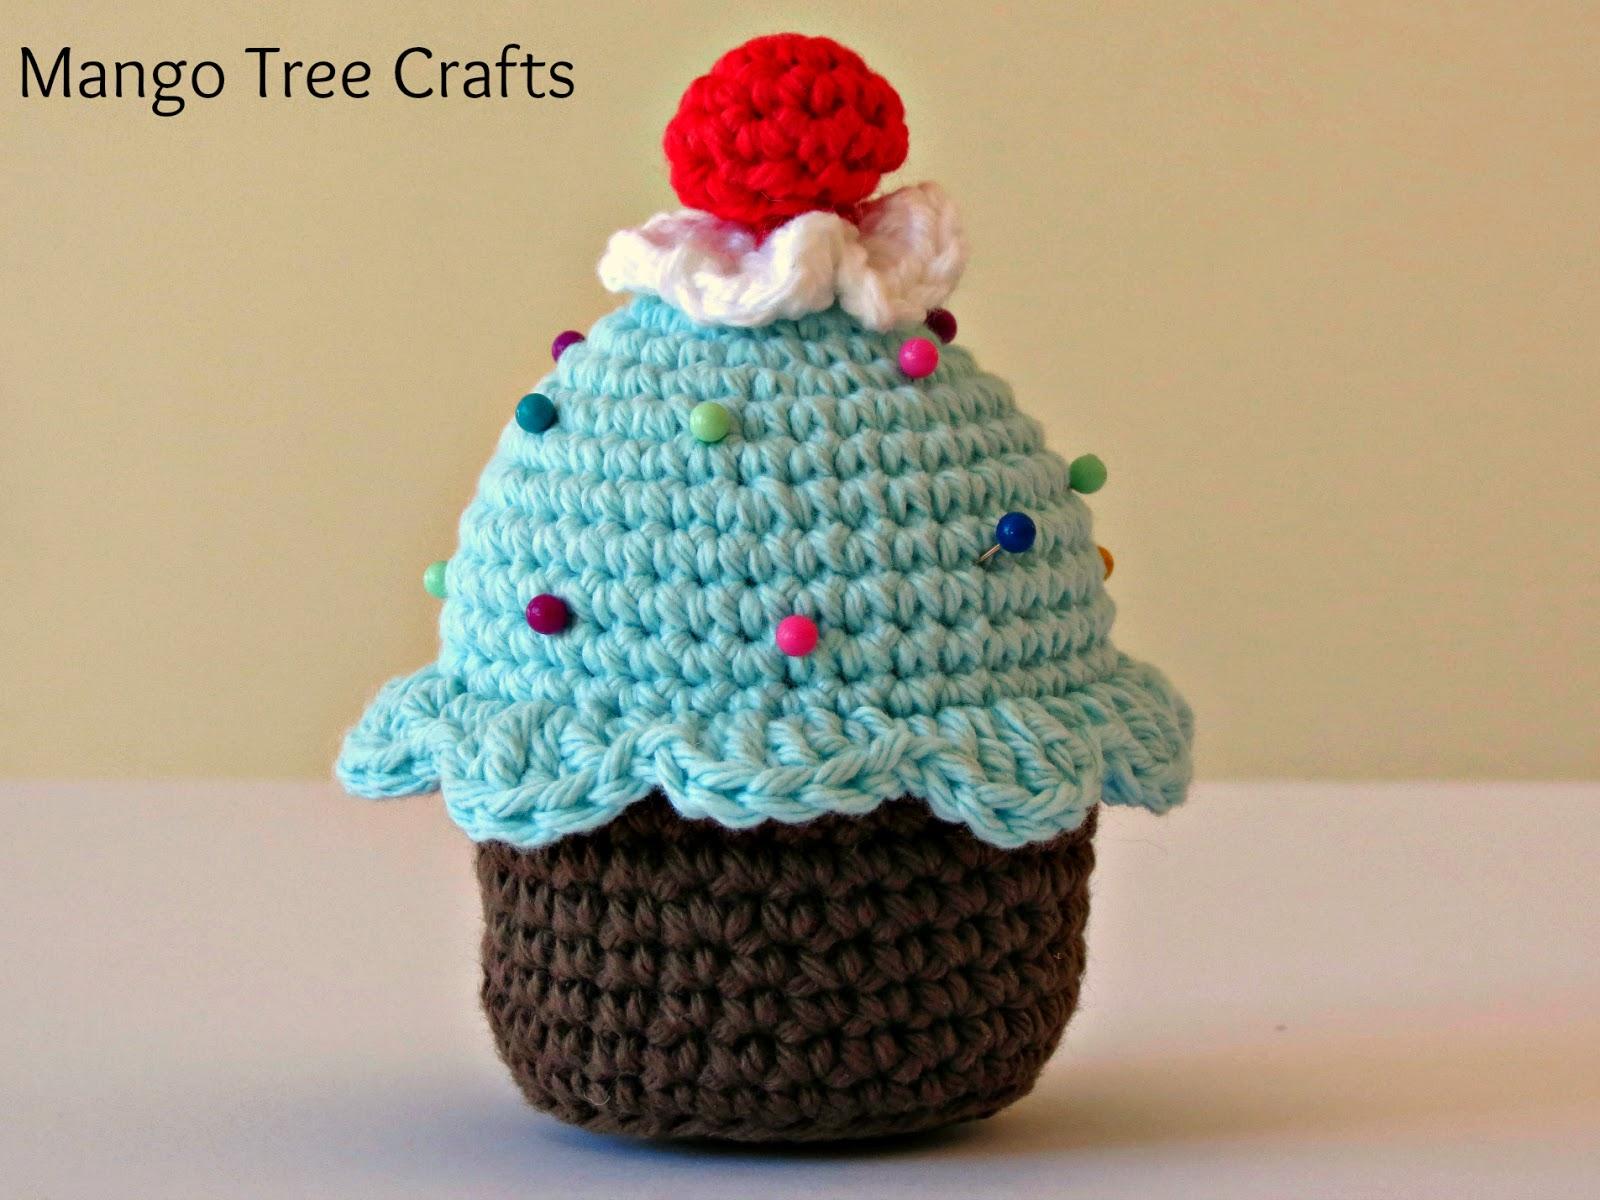 Mango tree crafts crochet cupcake pin cushion crochet cupcake pin cushion bankloansurffo Images